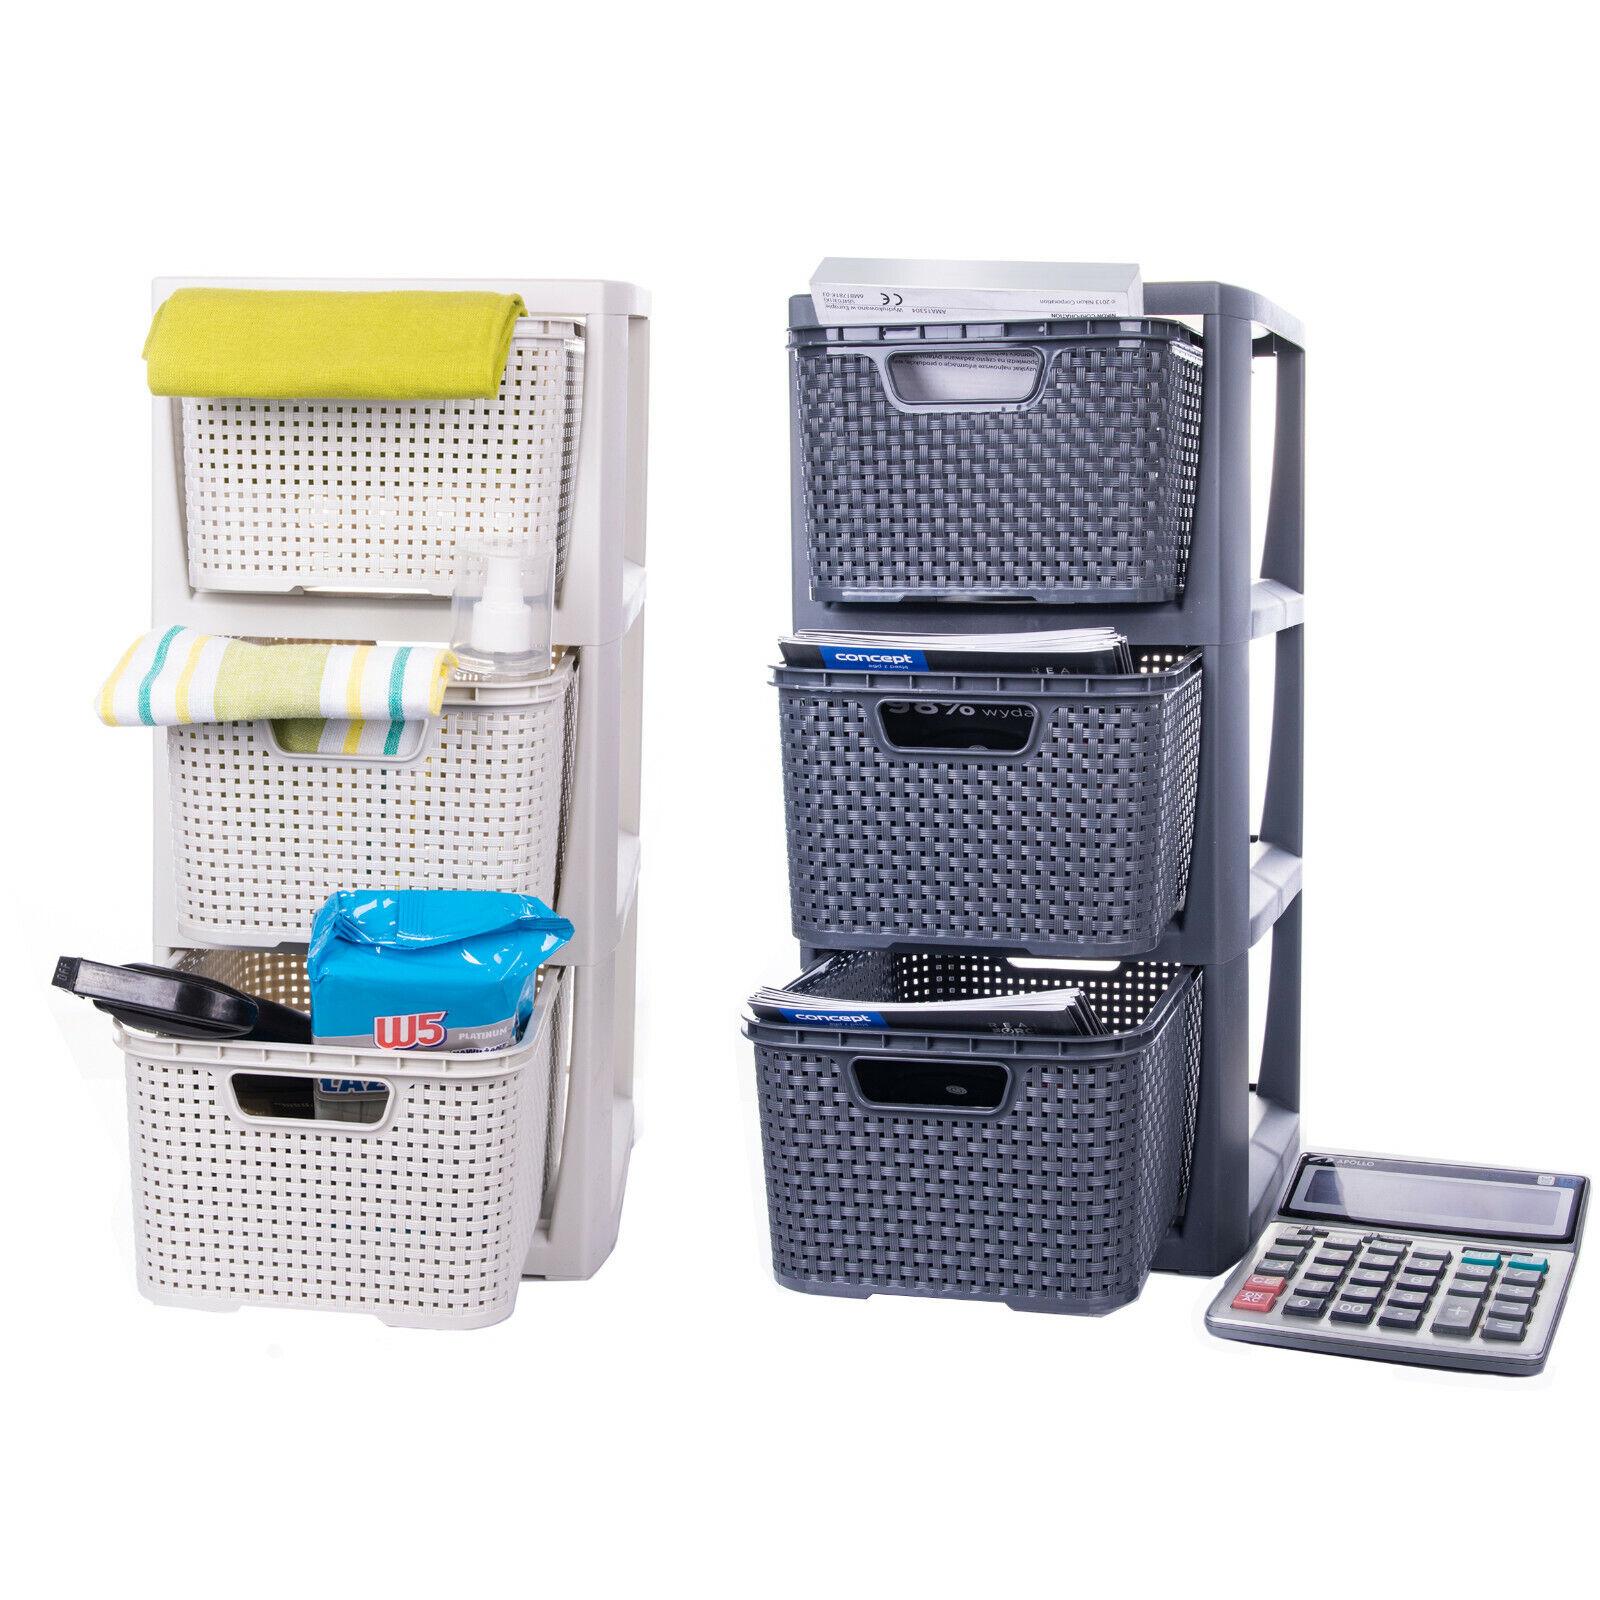 Korbregal mit 3 Schubladen aus Kunststoff Plastik Ordnungsbox Rattan Korbkommode